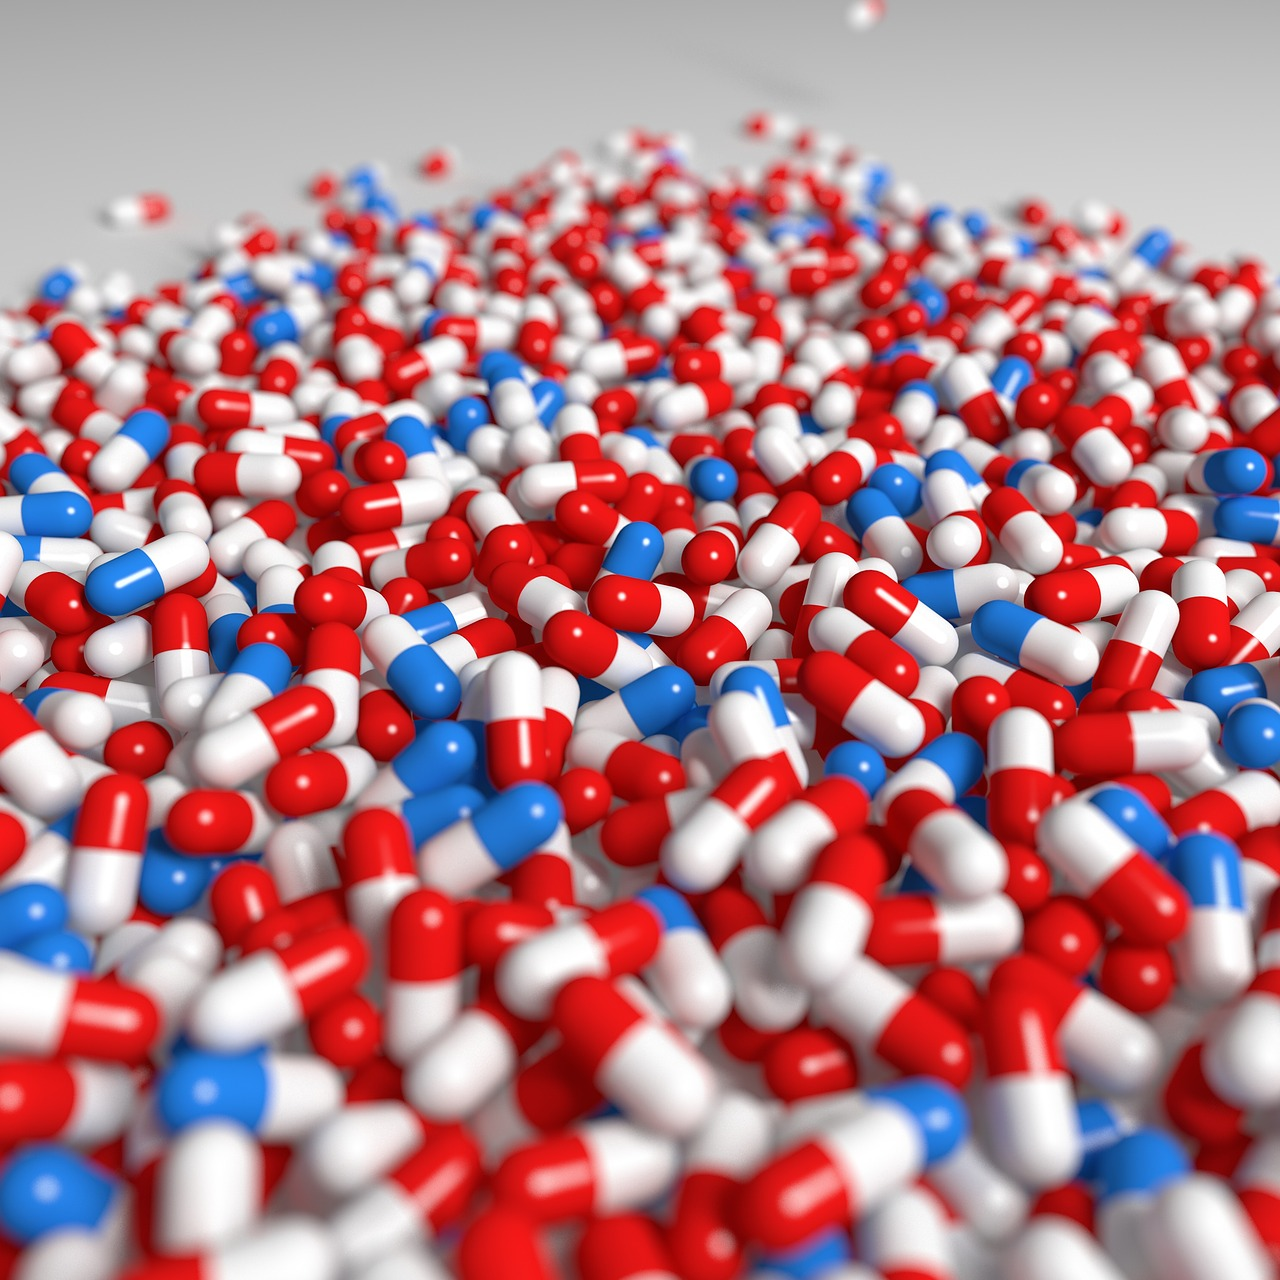 Artificial Intelligence Meets Drug Development